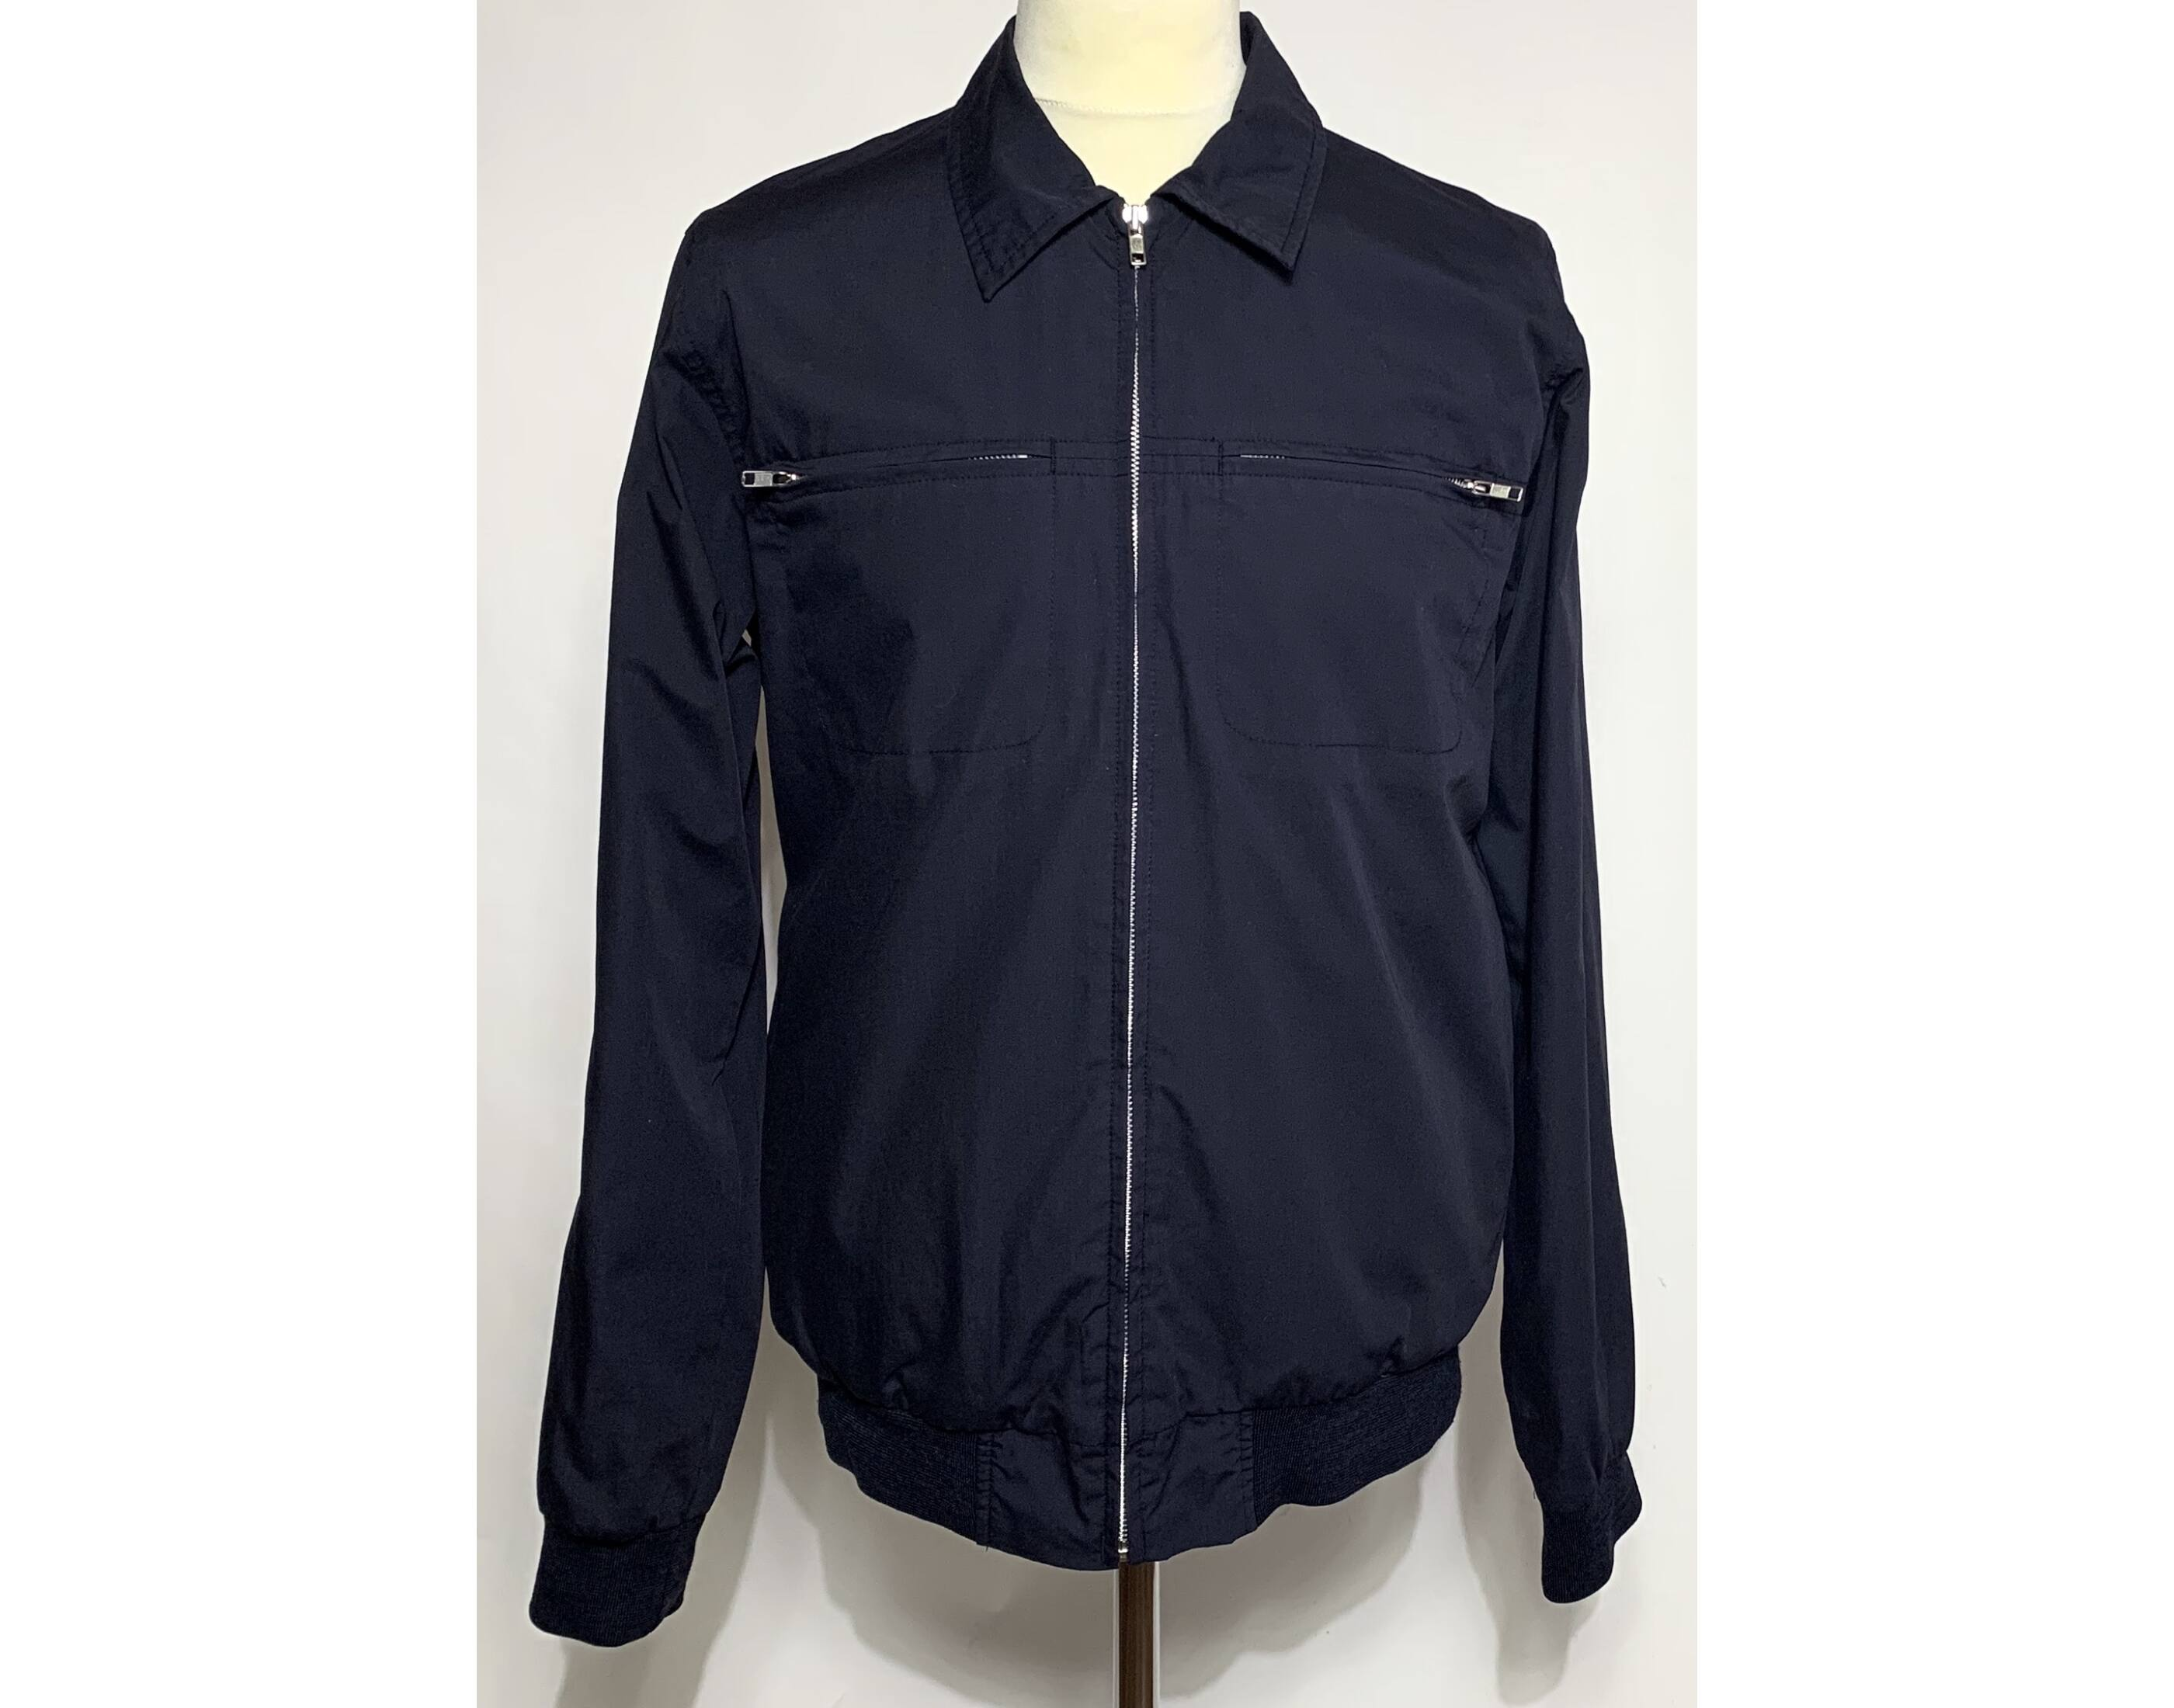 Carhartt kabát (L)